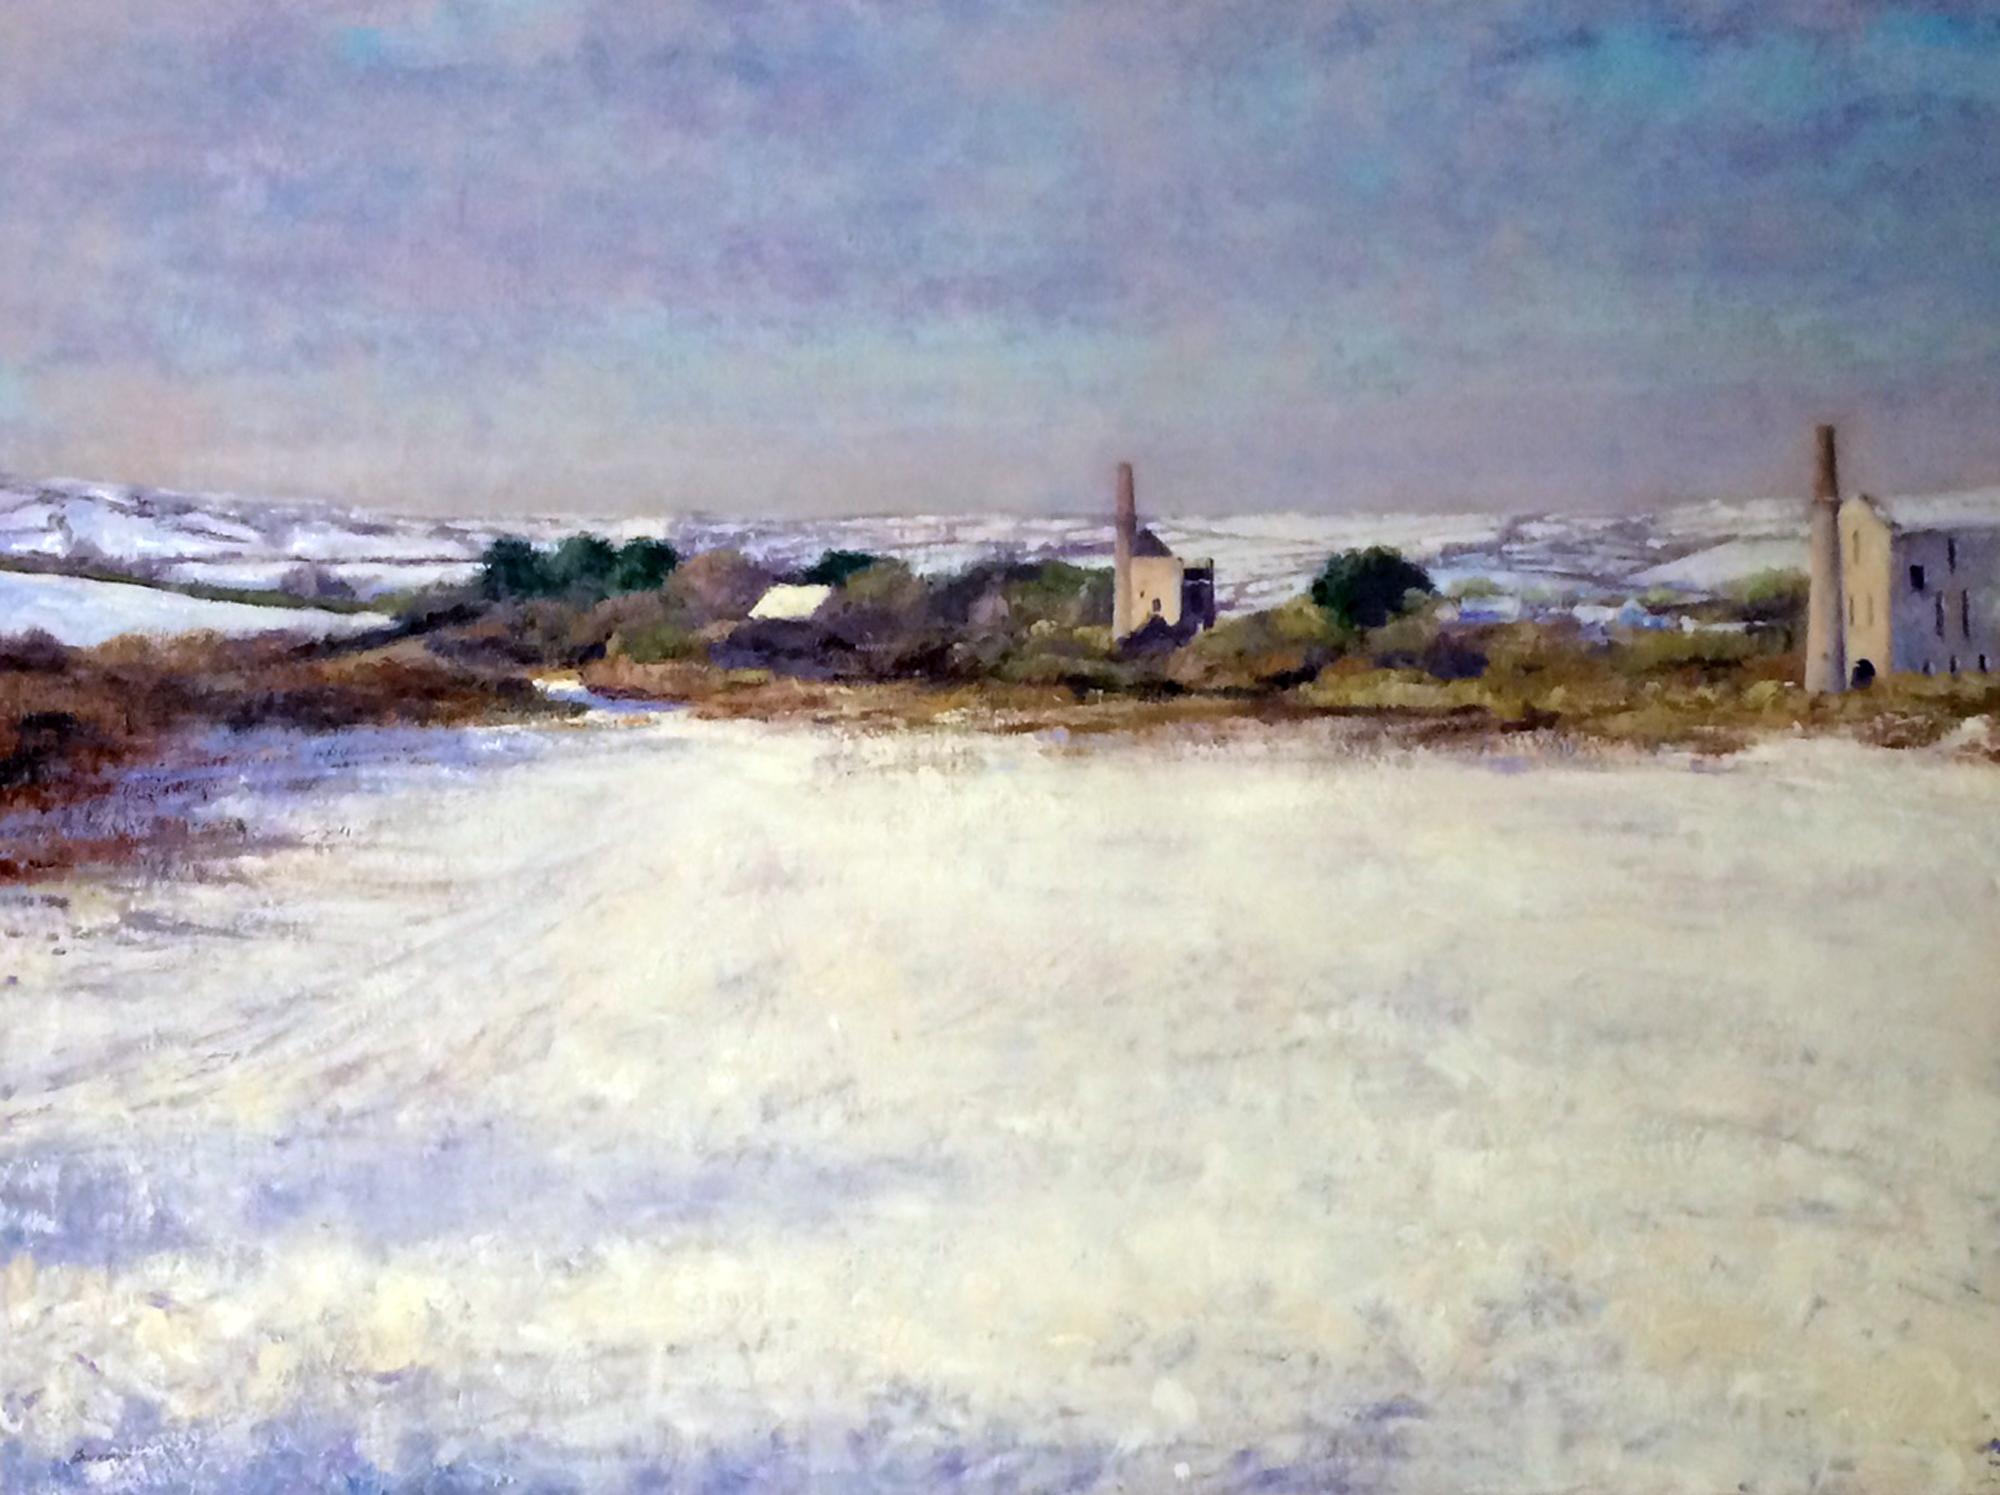 Andrew Barrowman, Morning snow, Cornwall, Oil on canvas, 78cm x 102cm x 3cm,  http://www.andrewbarrowman.com